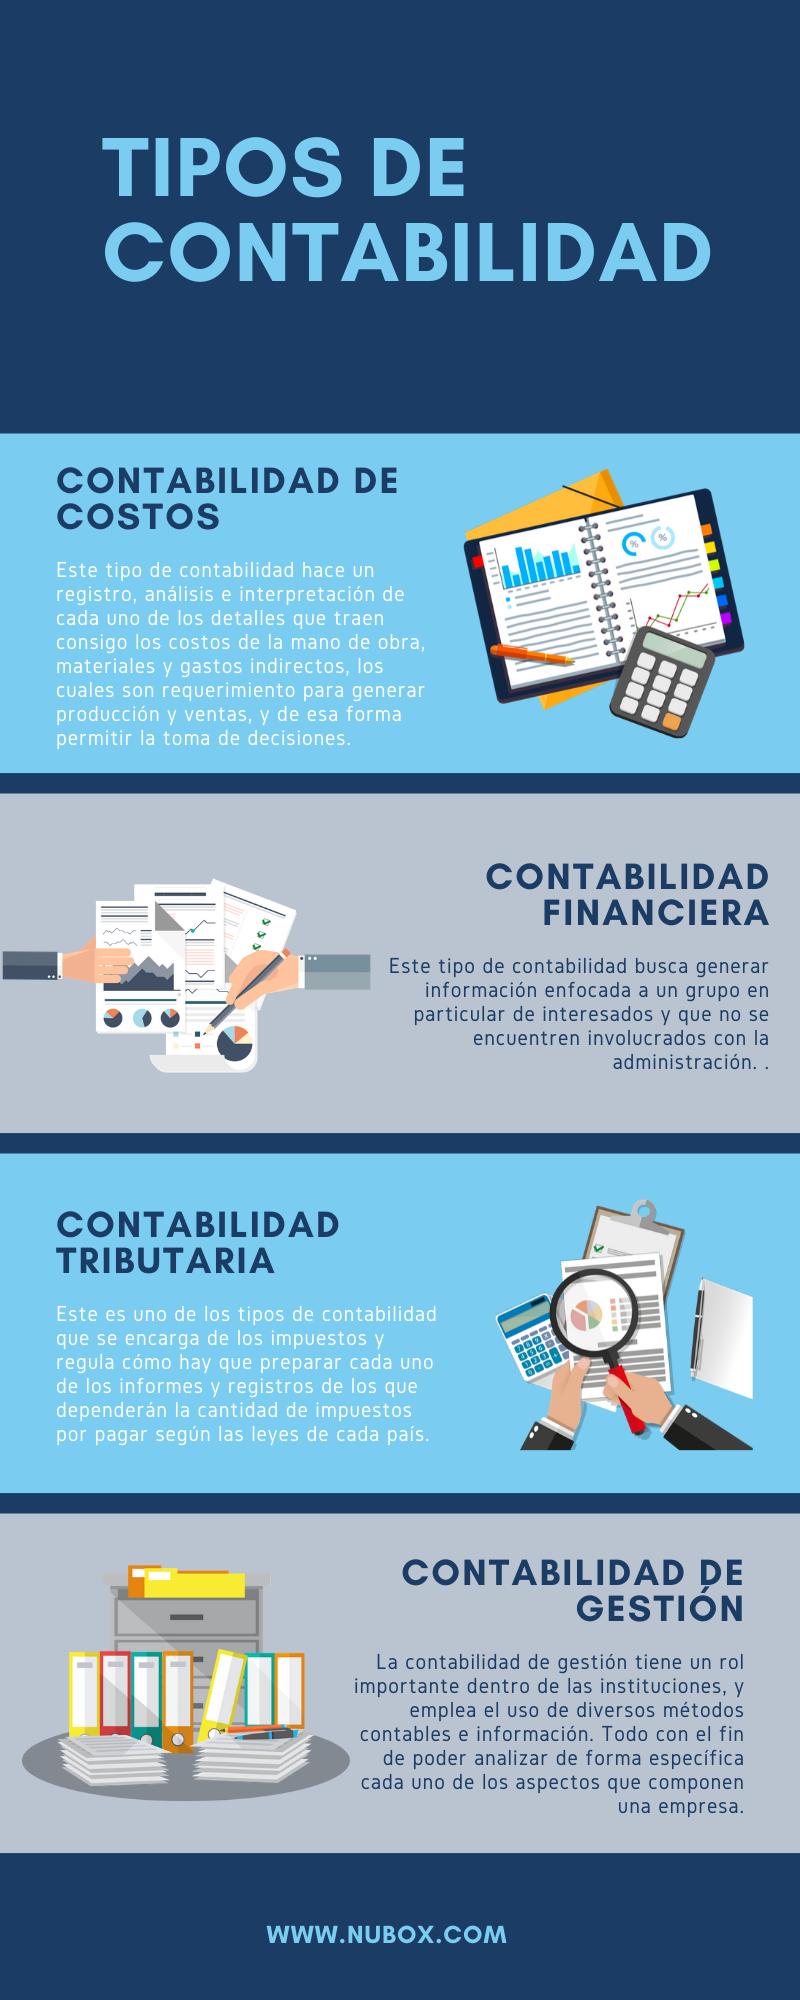 infografia-tipos -de-contabilidad